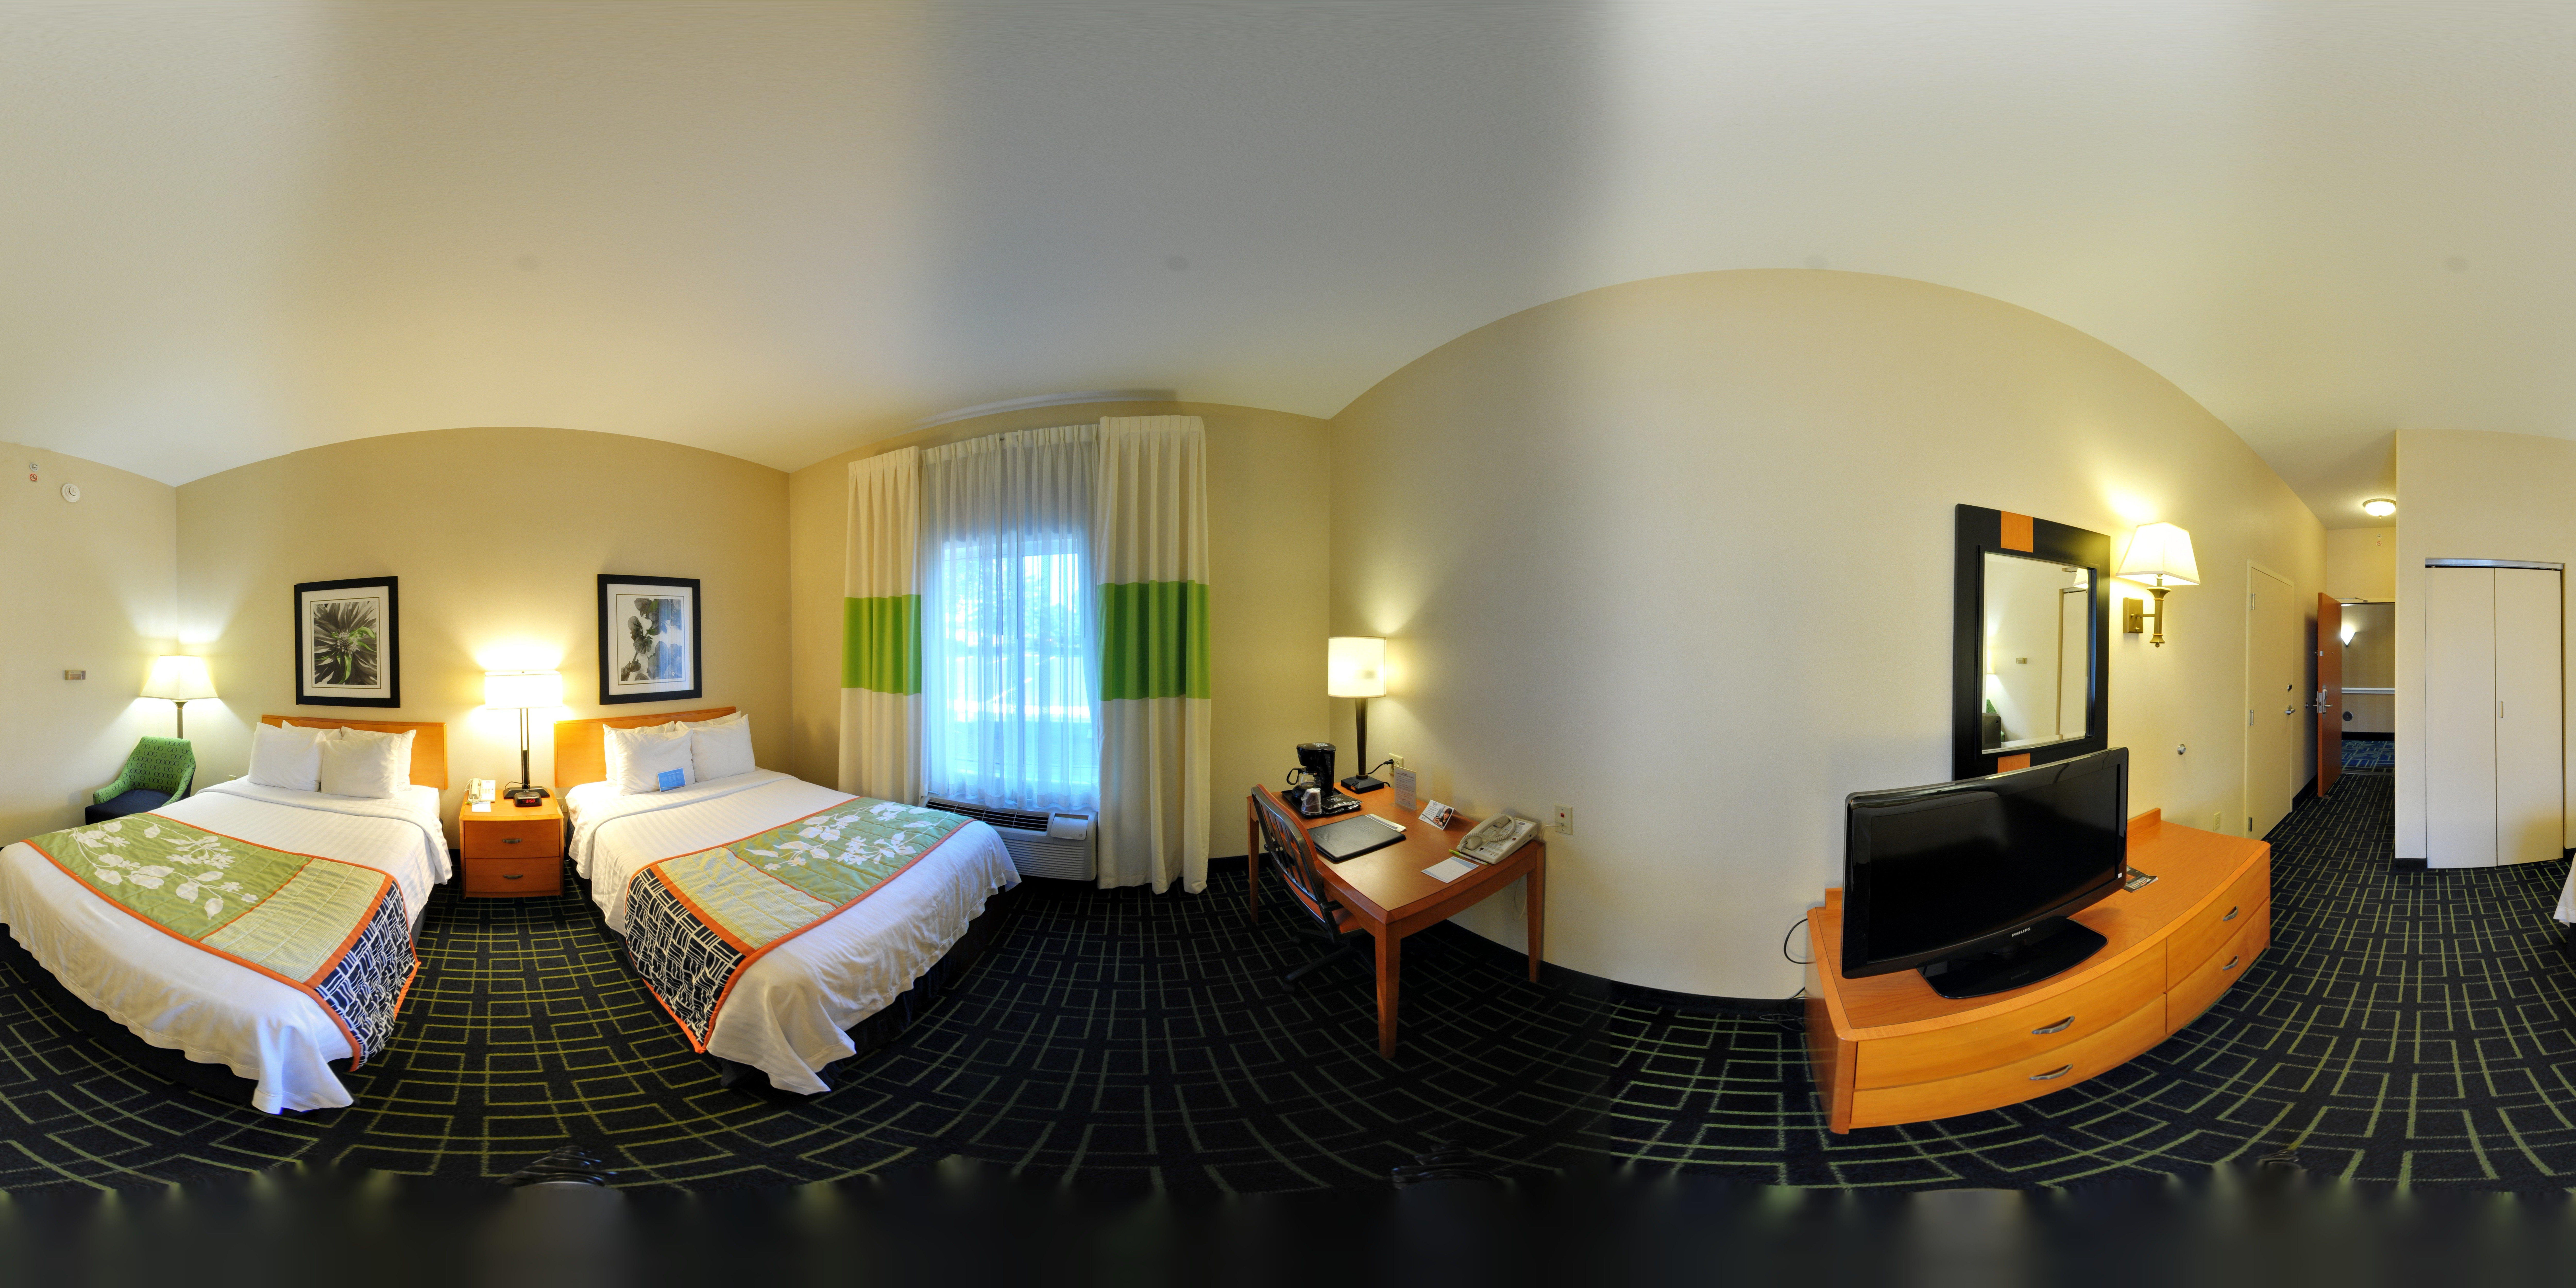 Fairfield Inn & Suites by Marriott Akron South image 38